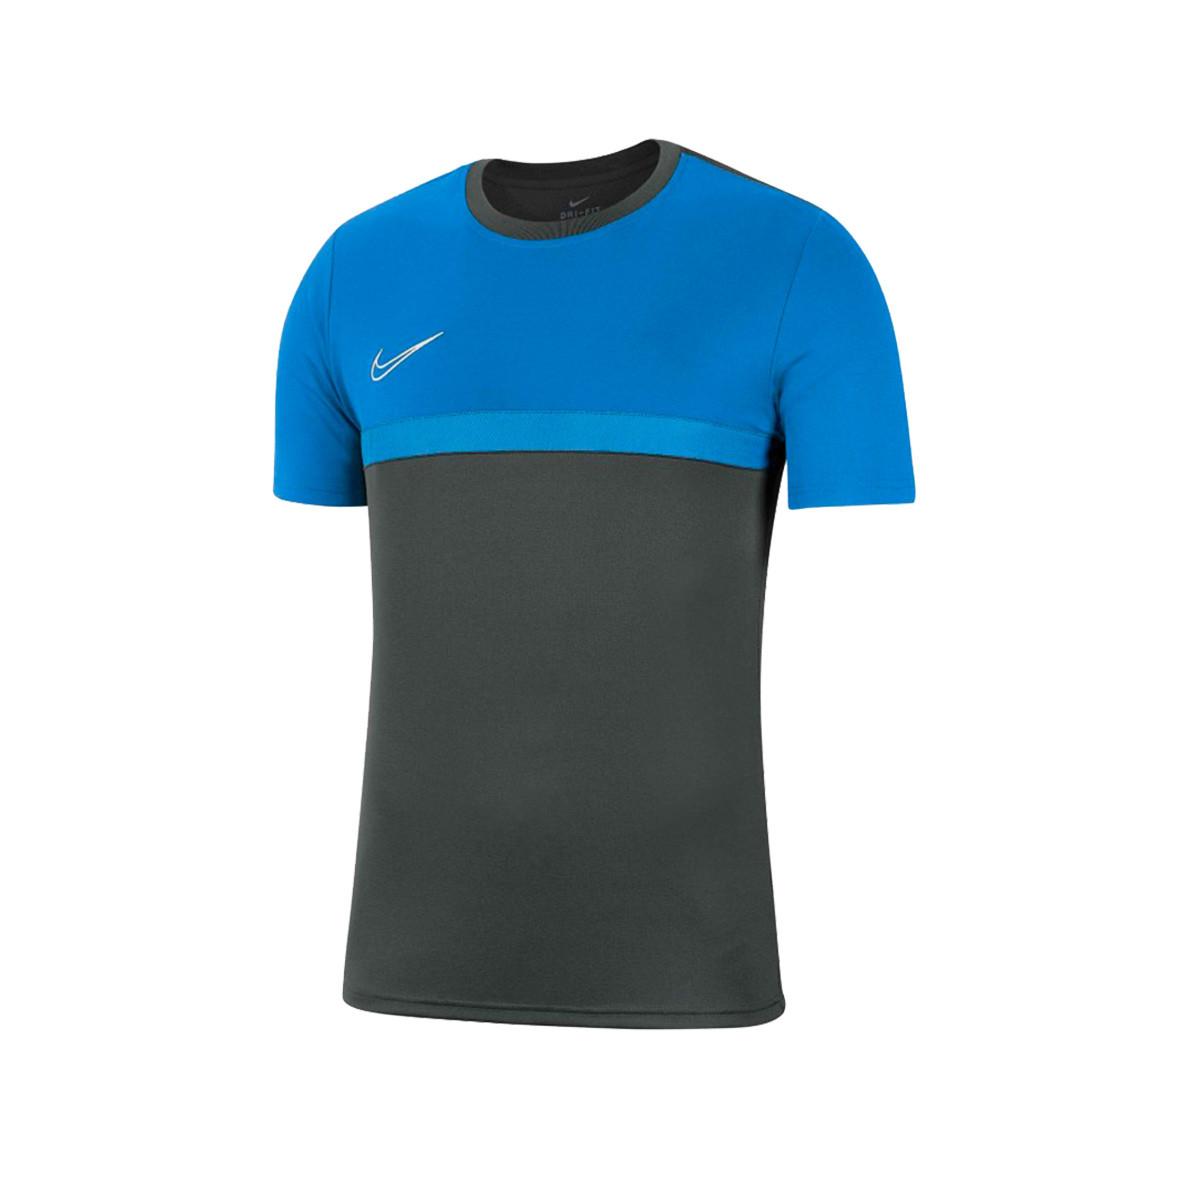 Porcentaje penitencia Lírico  Jersey Nike Kids Academy Pro Training Anthracite-Photo blue - Football  store Fútbol Emotion